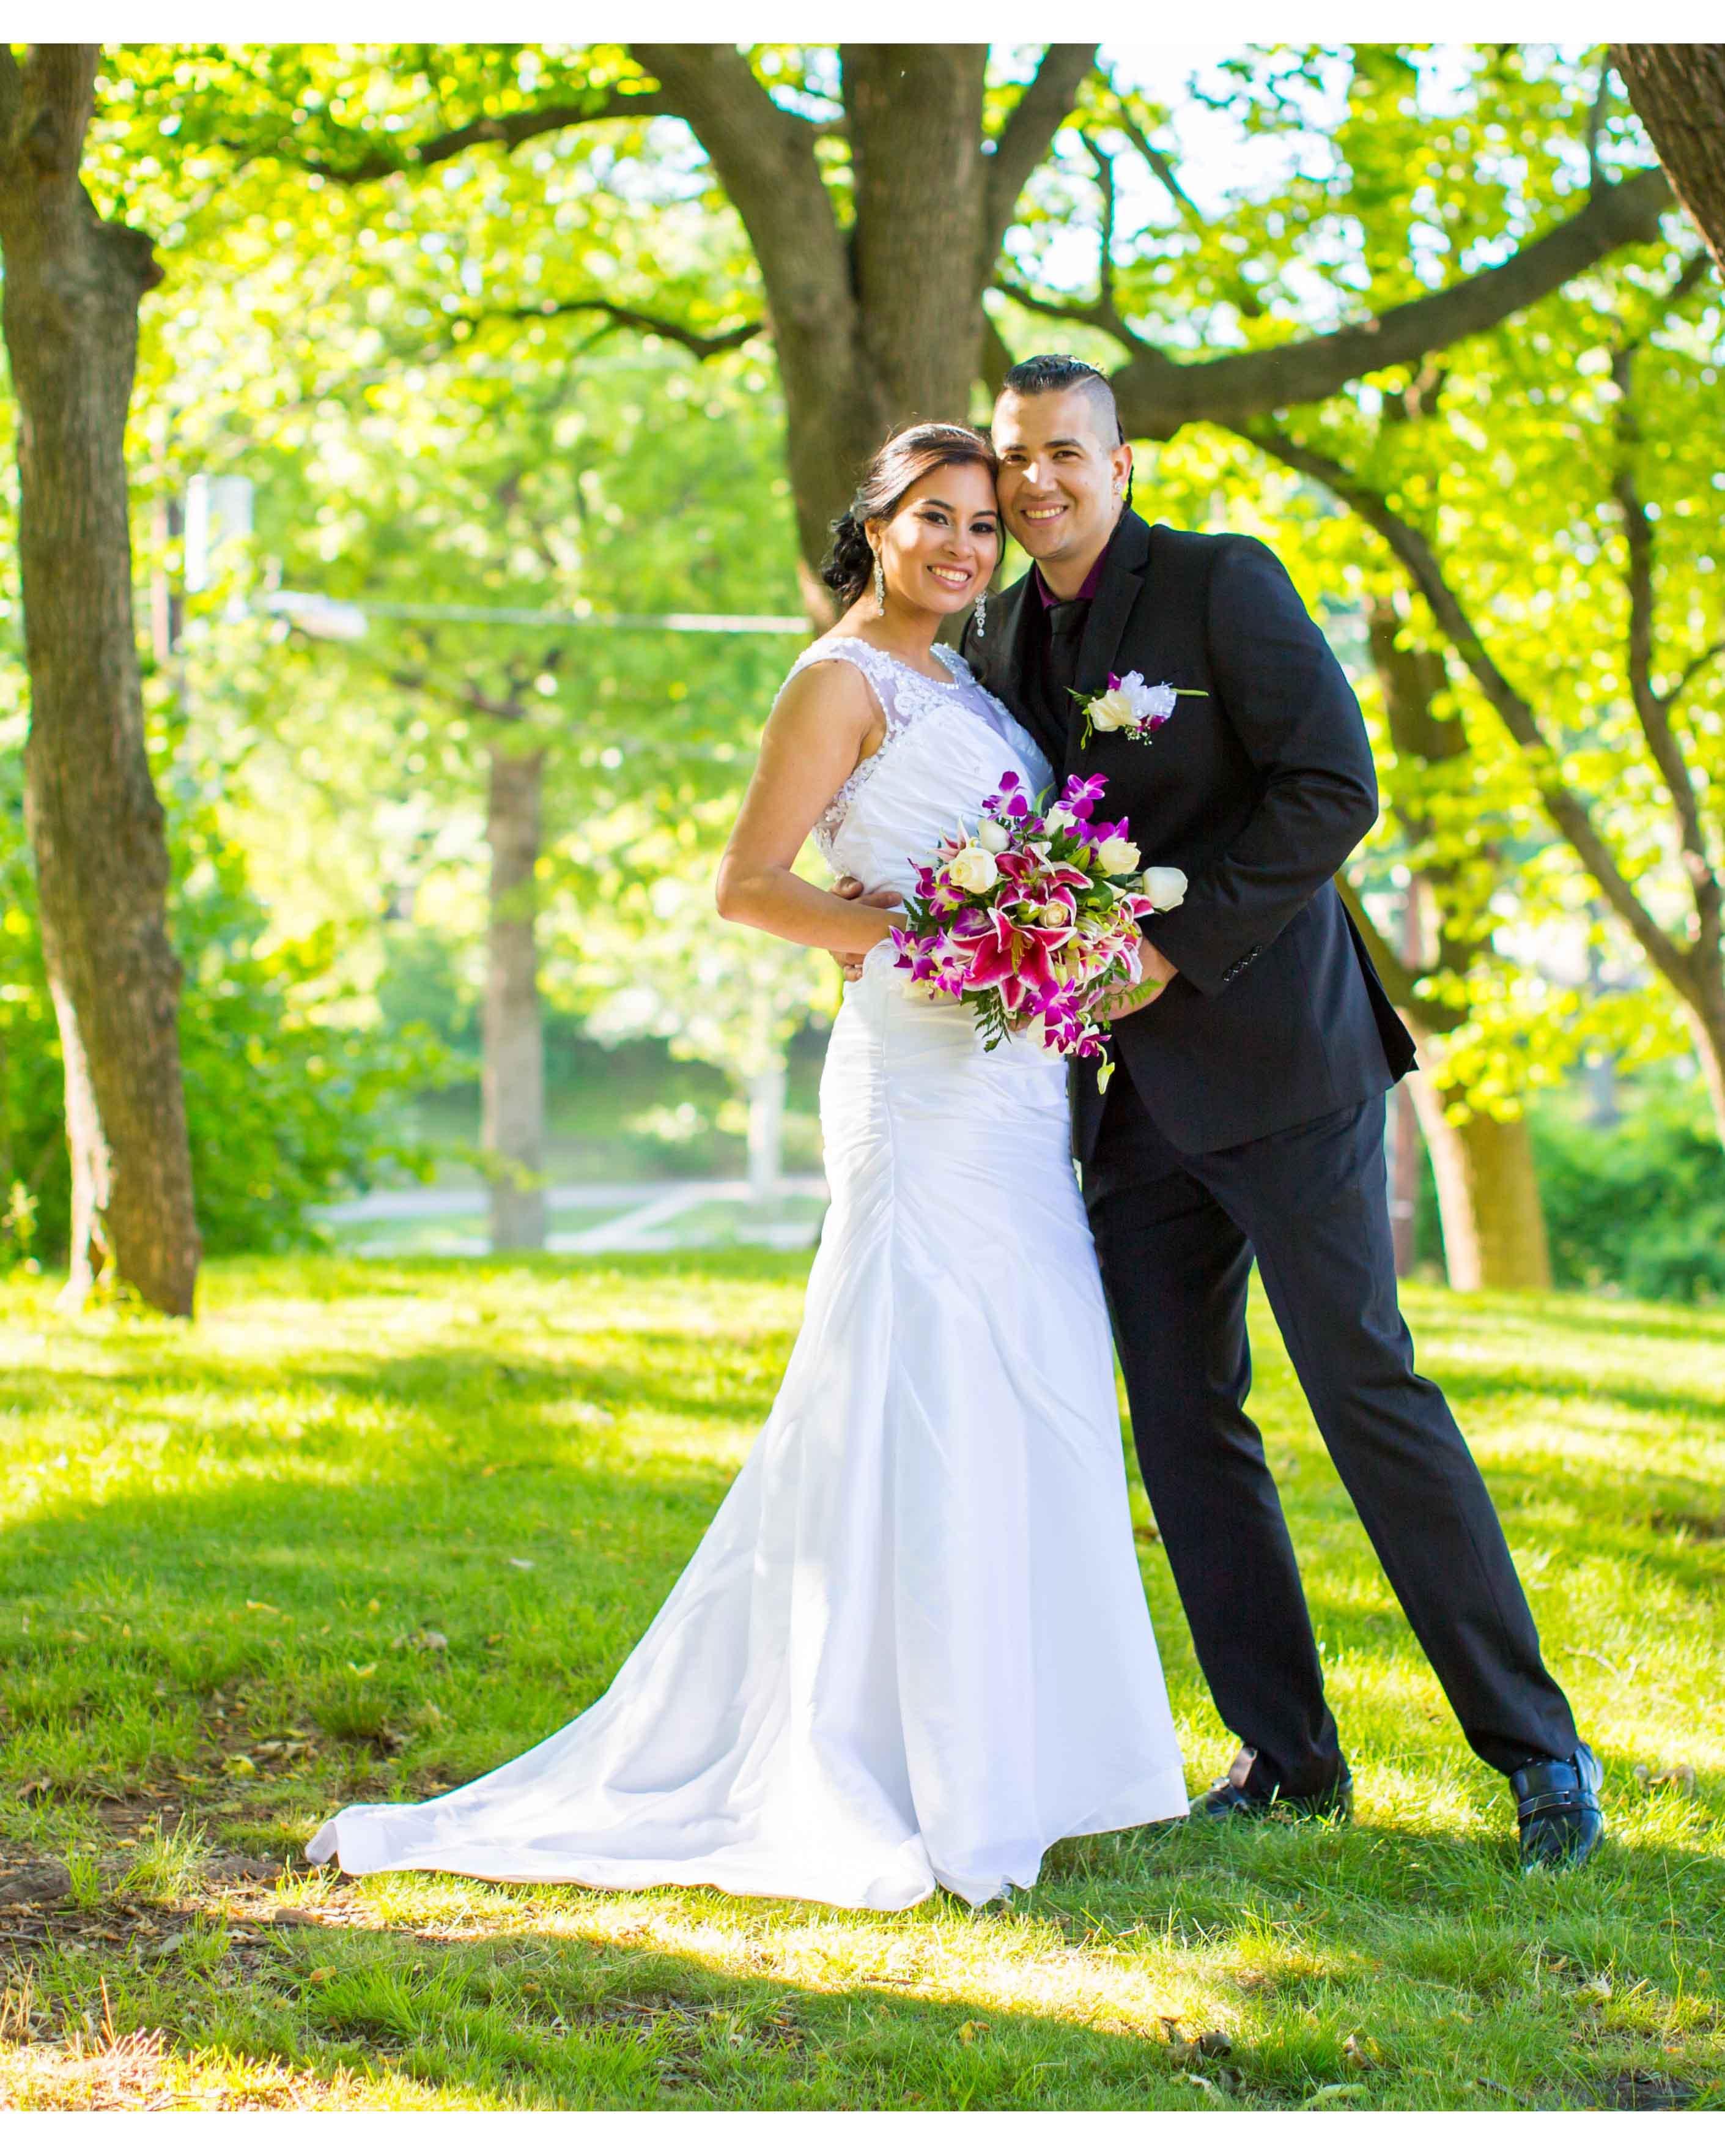 Cheap Wedding Gowns Under 100 Dollars: Most Popular, Beach, Wedding Dresses: Affordable & Under